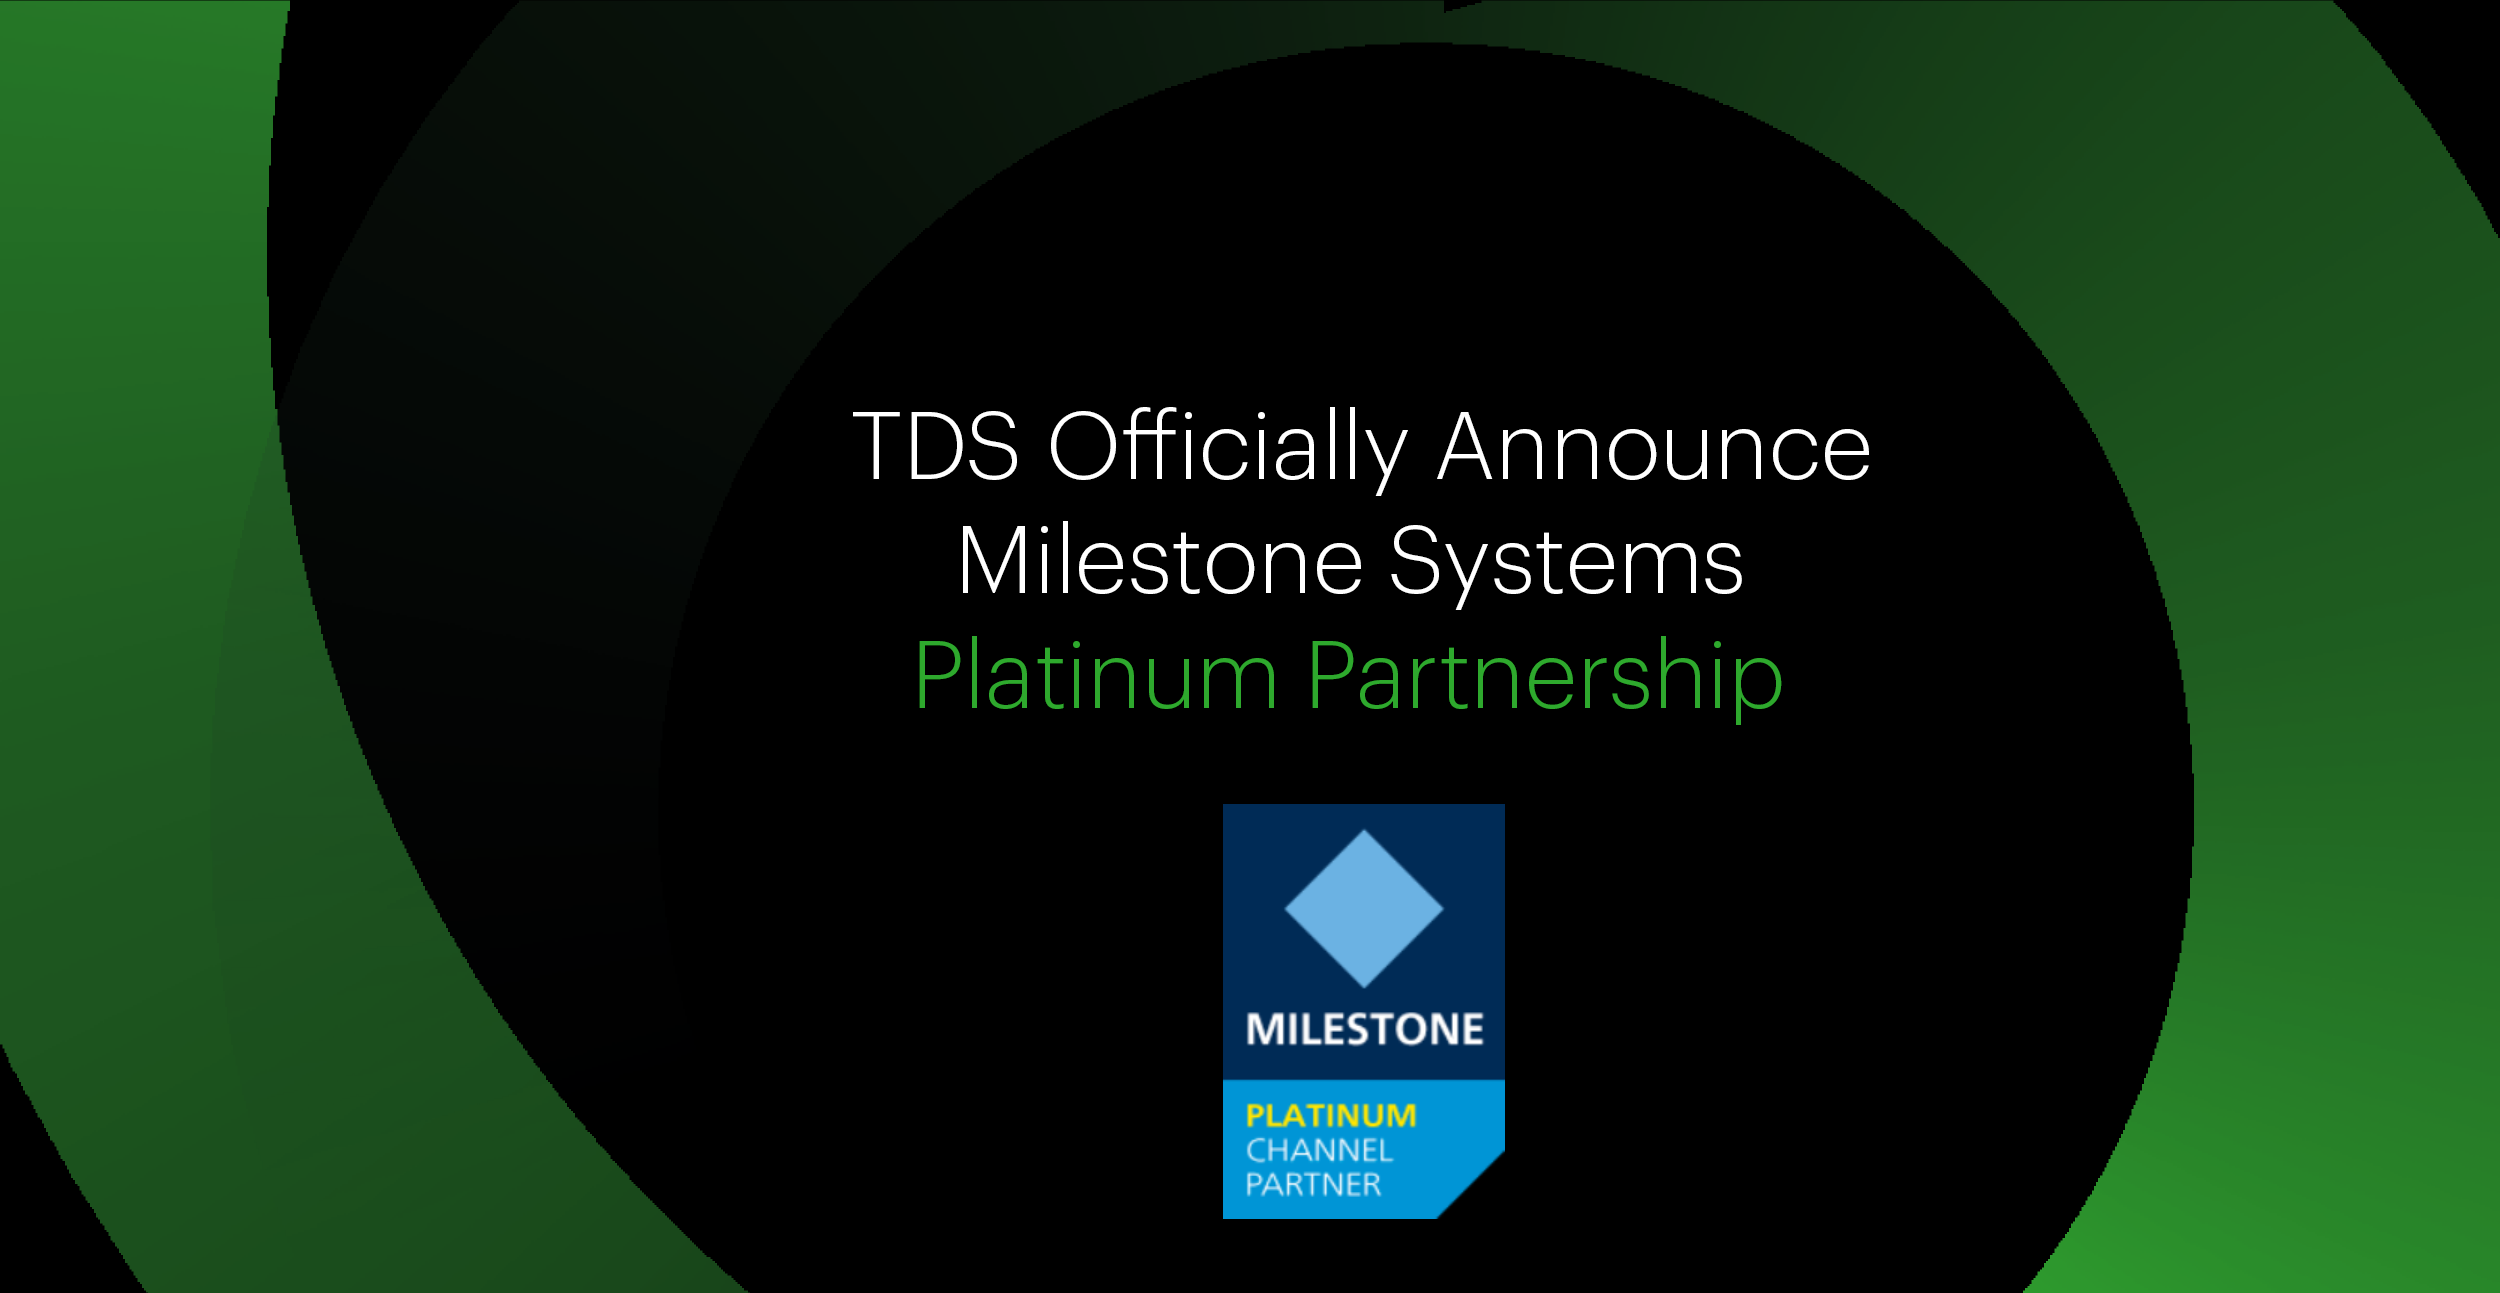 TDS-x-Milestone-Solutions-Partnership-3